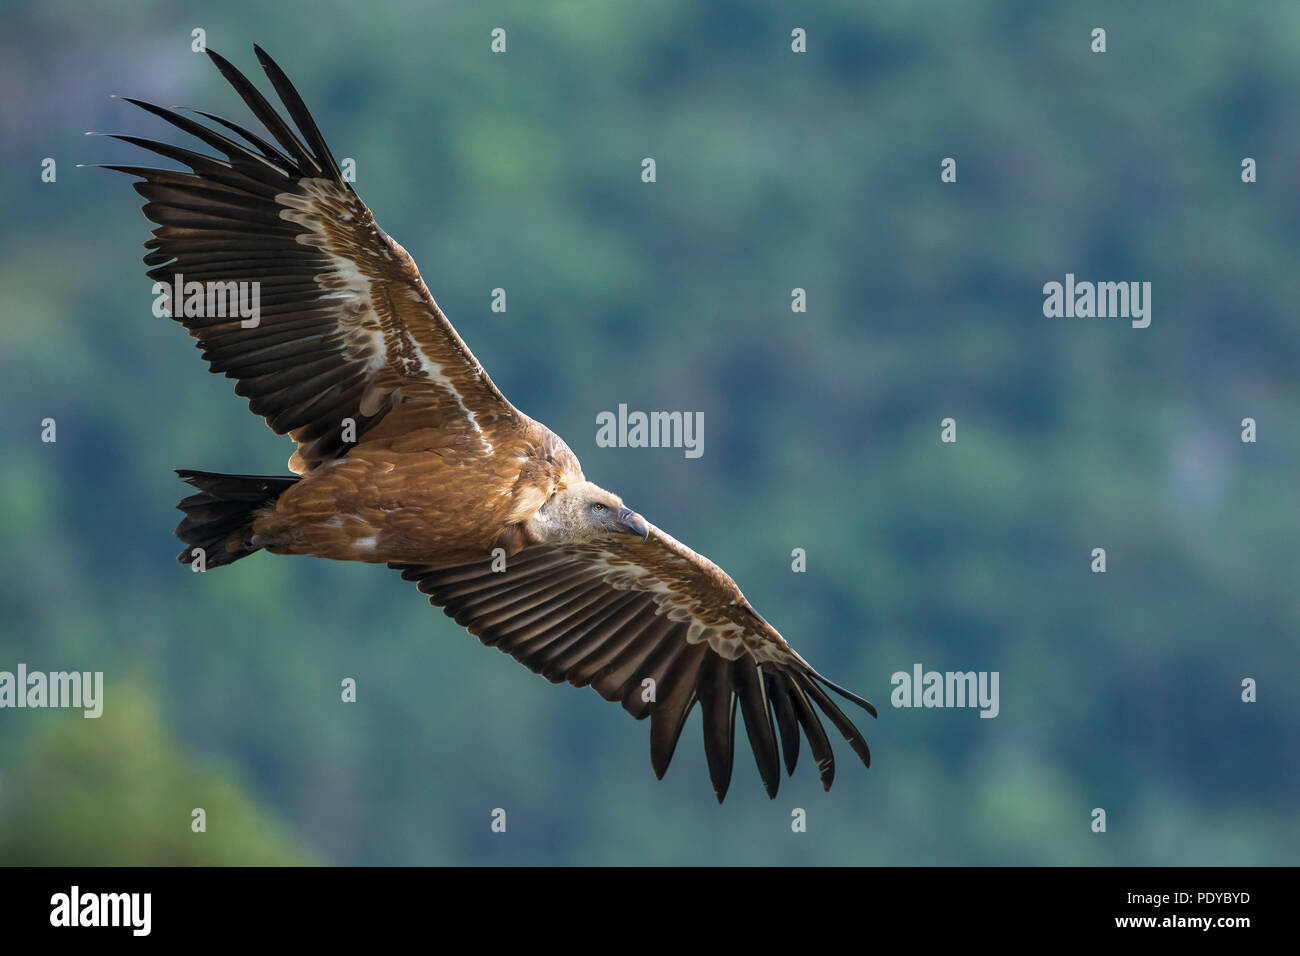 Griffon Vulture (Gyps fulvus) flying - Stock Image